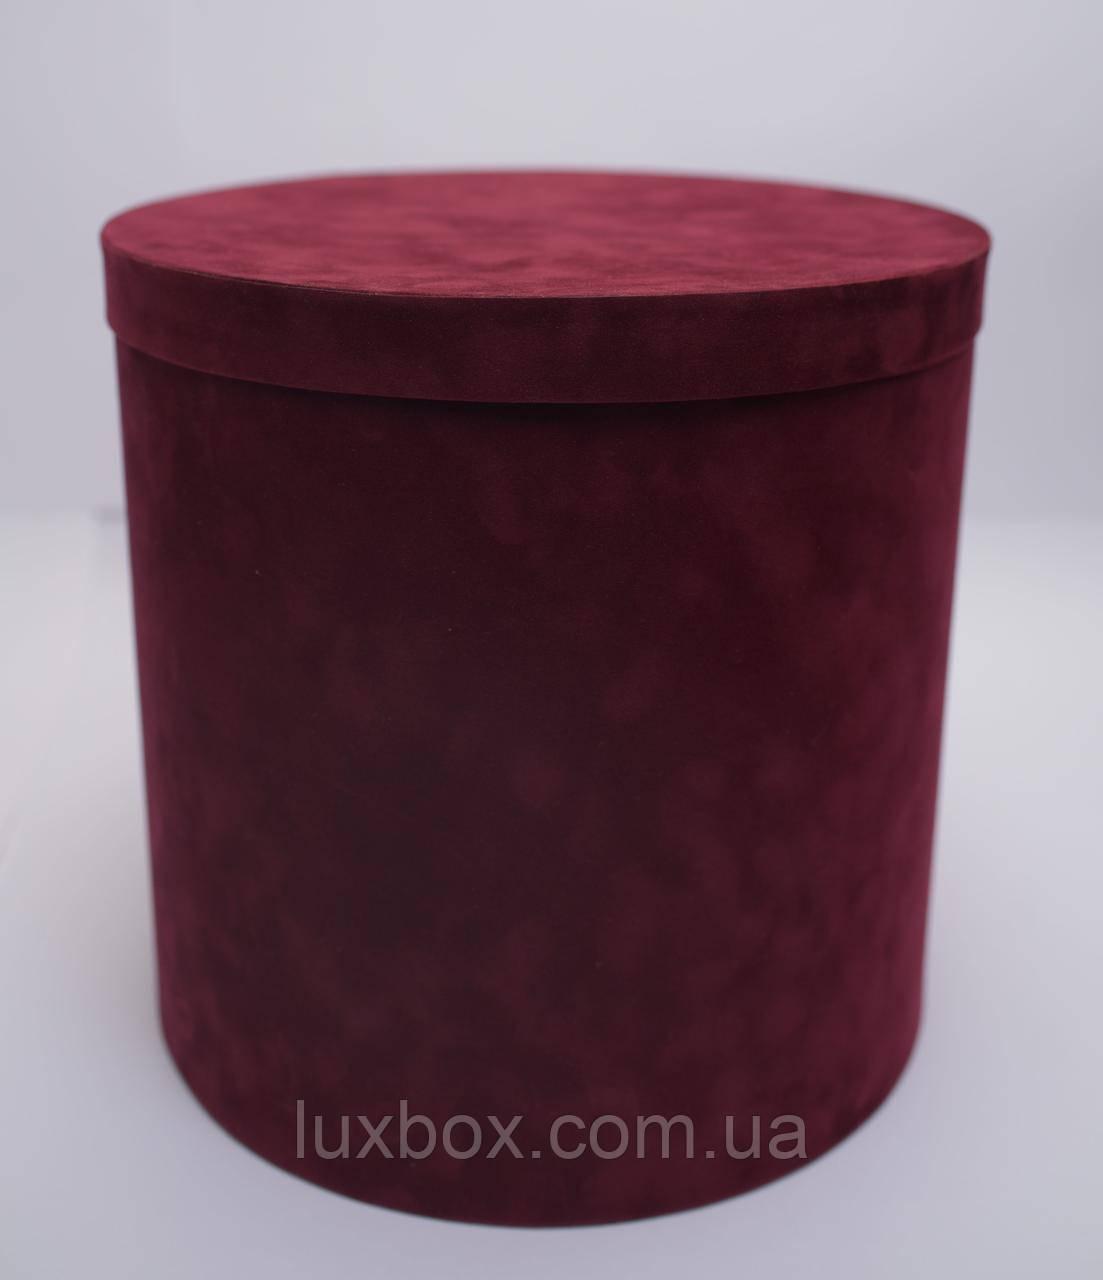 Шляпна коробка Велюрова(бархатна коробка) h20/d20